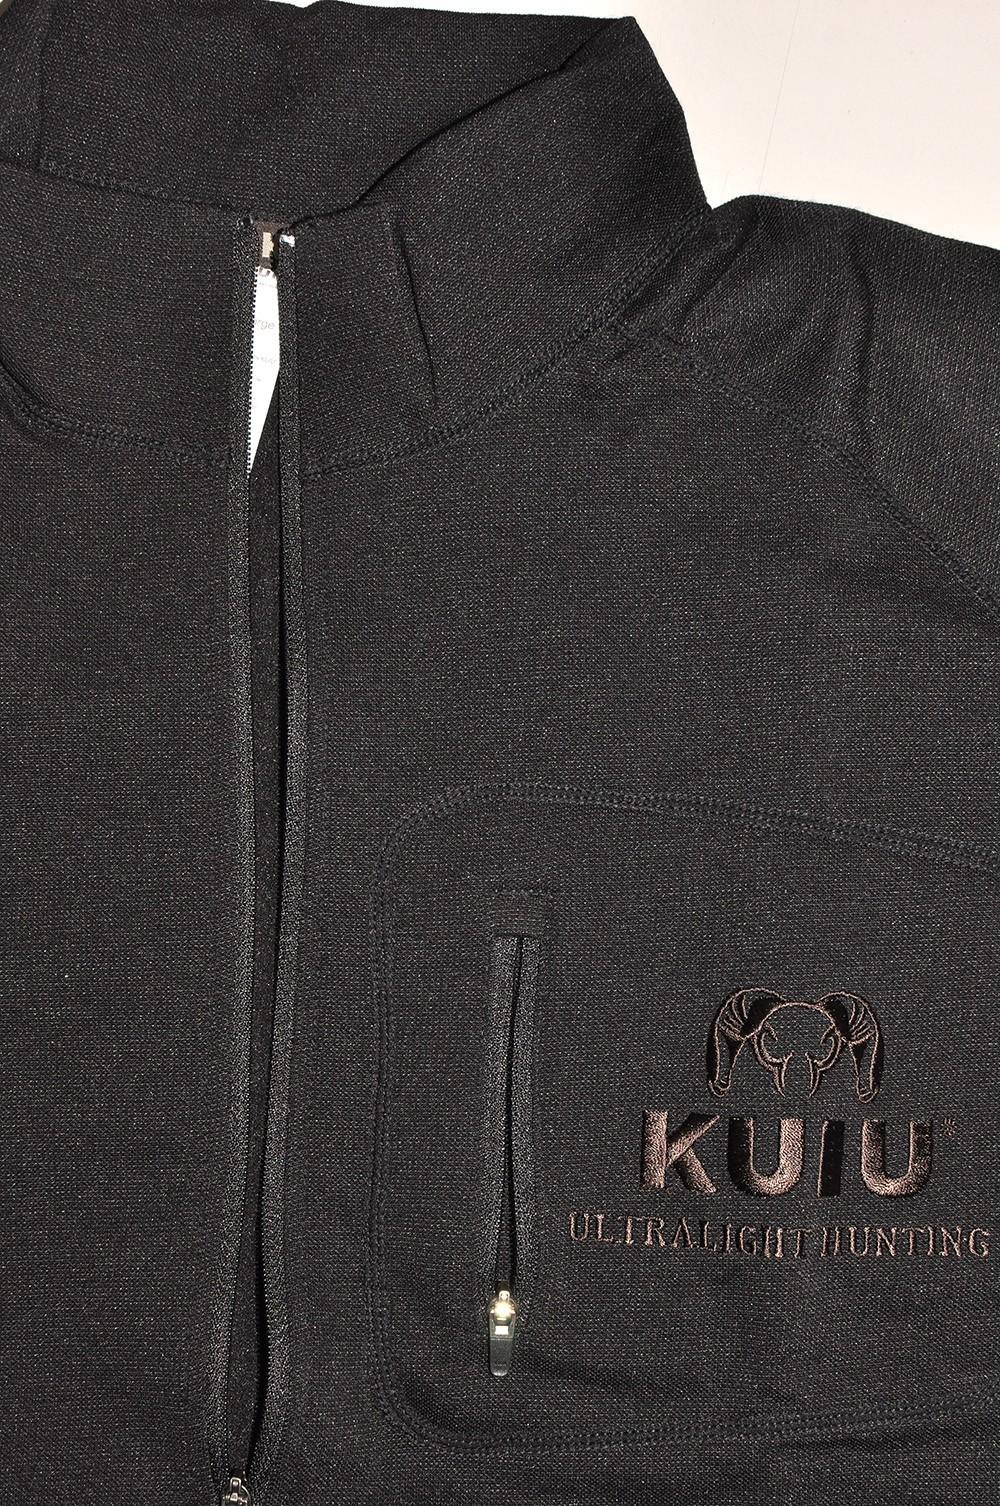 KUIU-Merino-Blend-Jkts1x5x